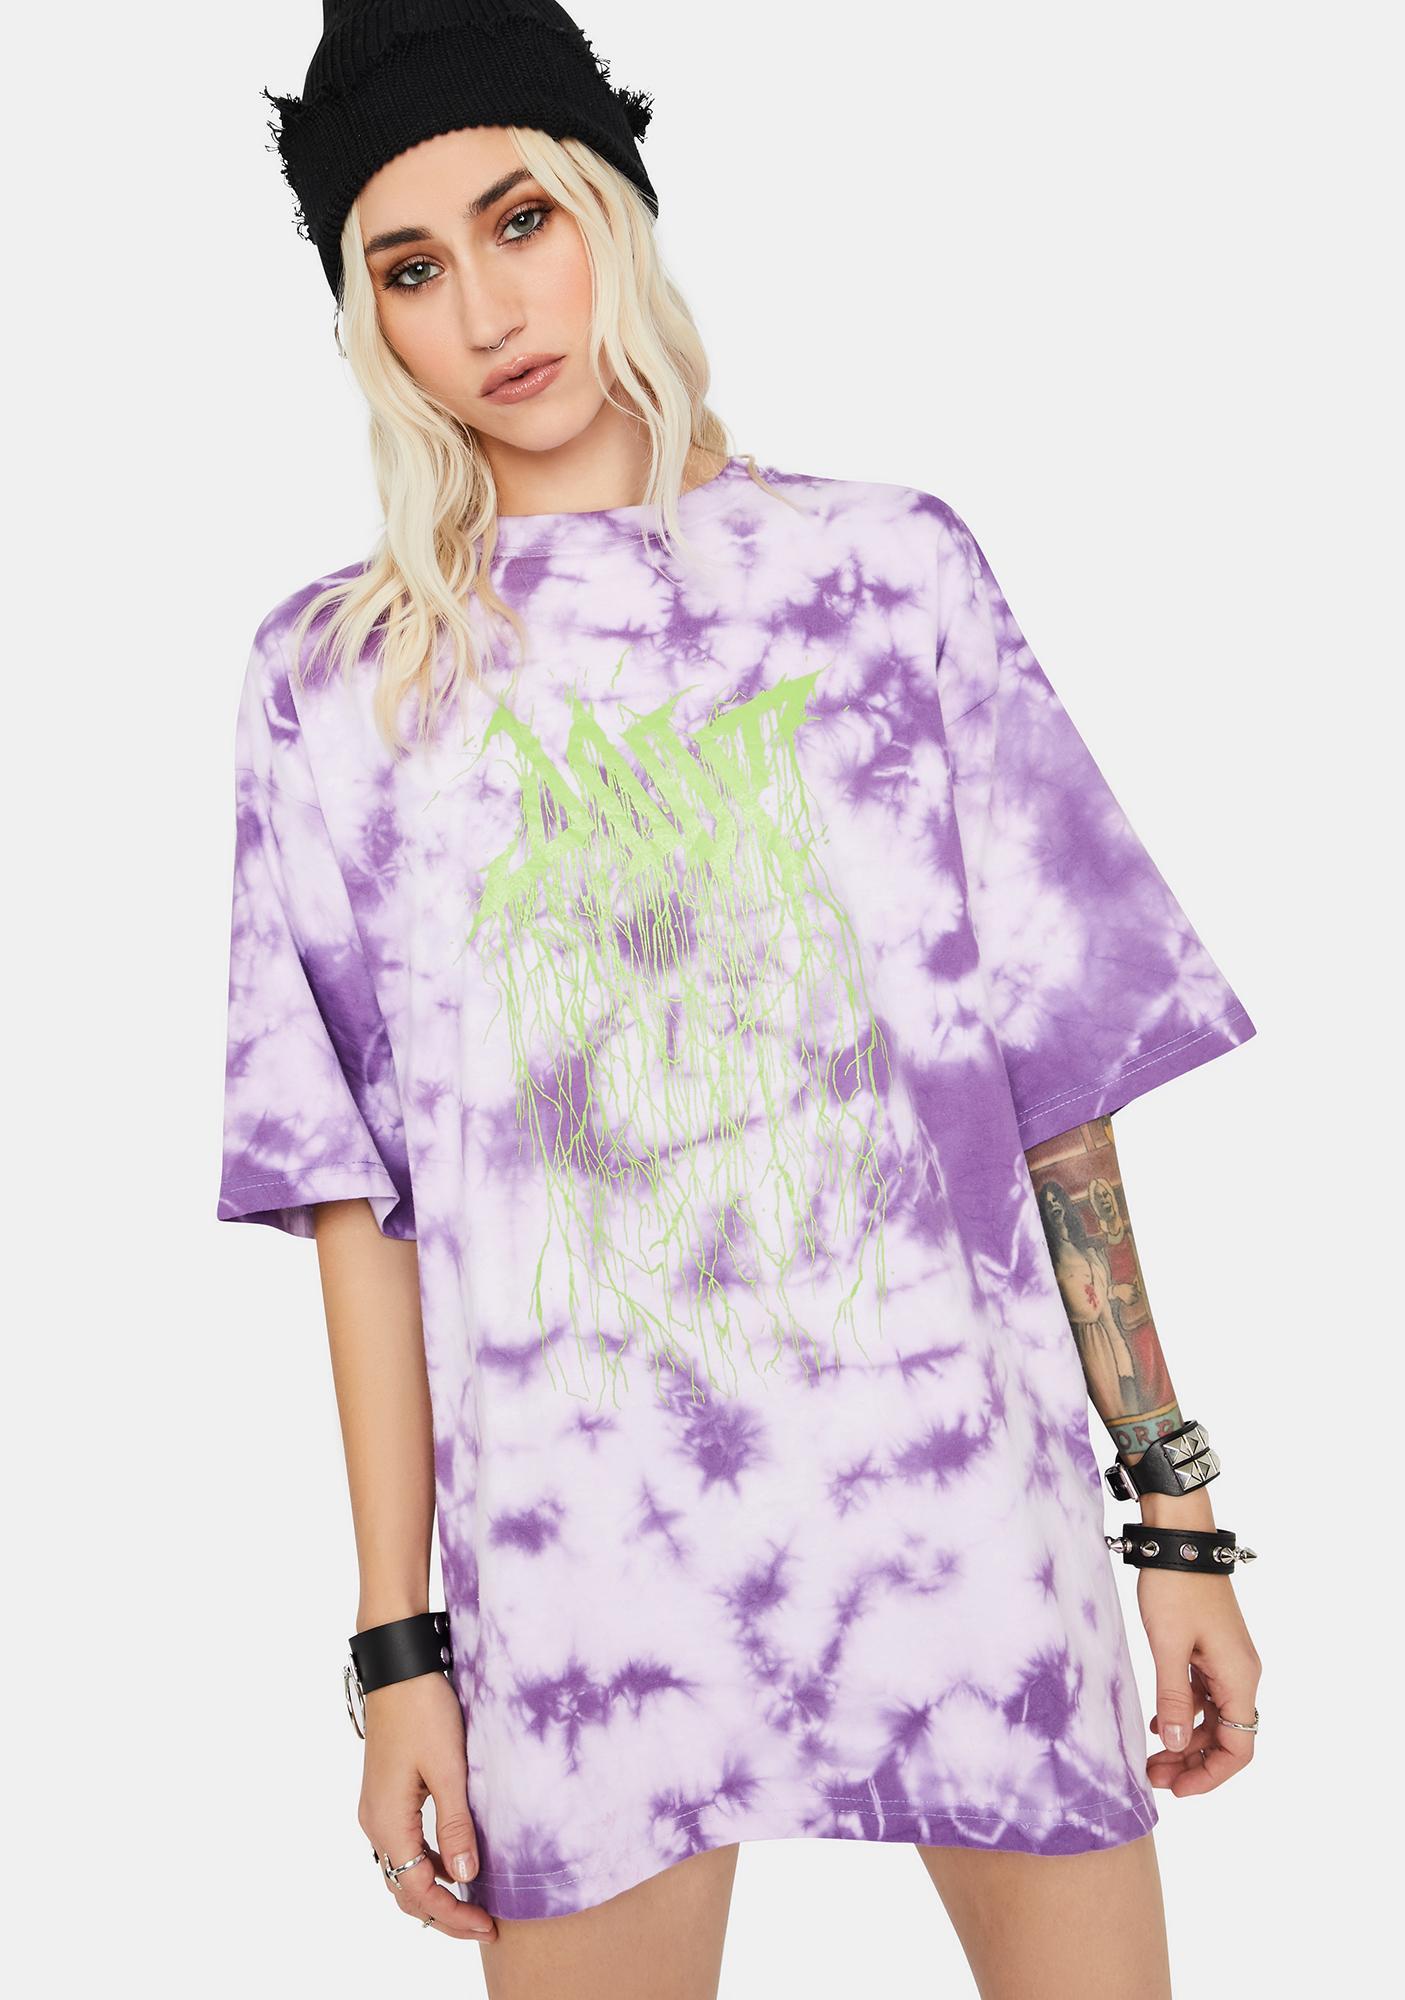 DOOM 3K Violet Tie Dye Tee